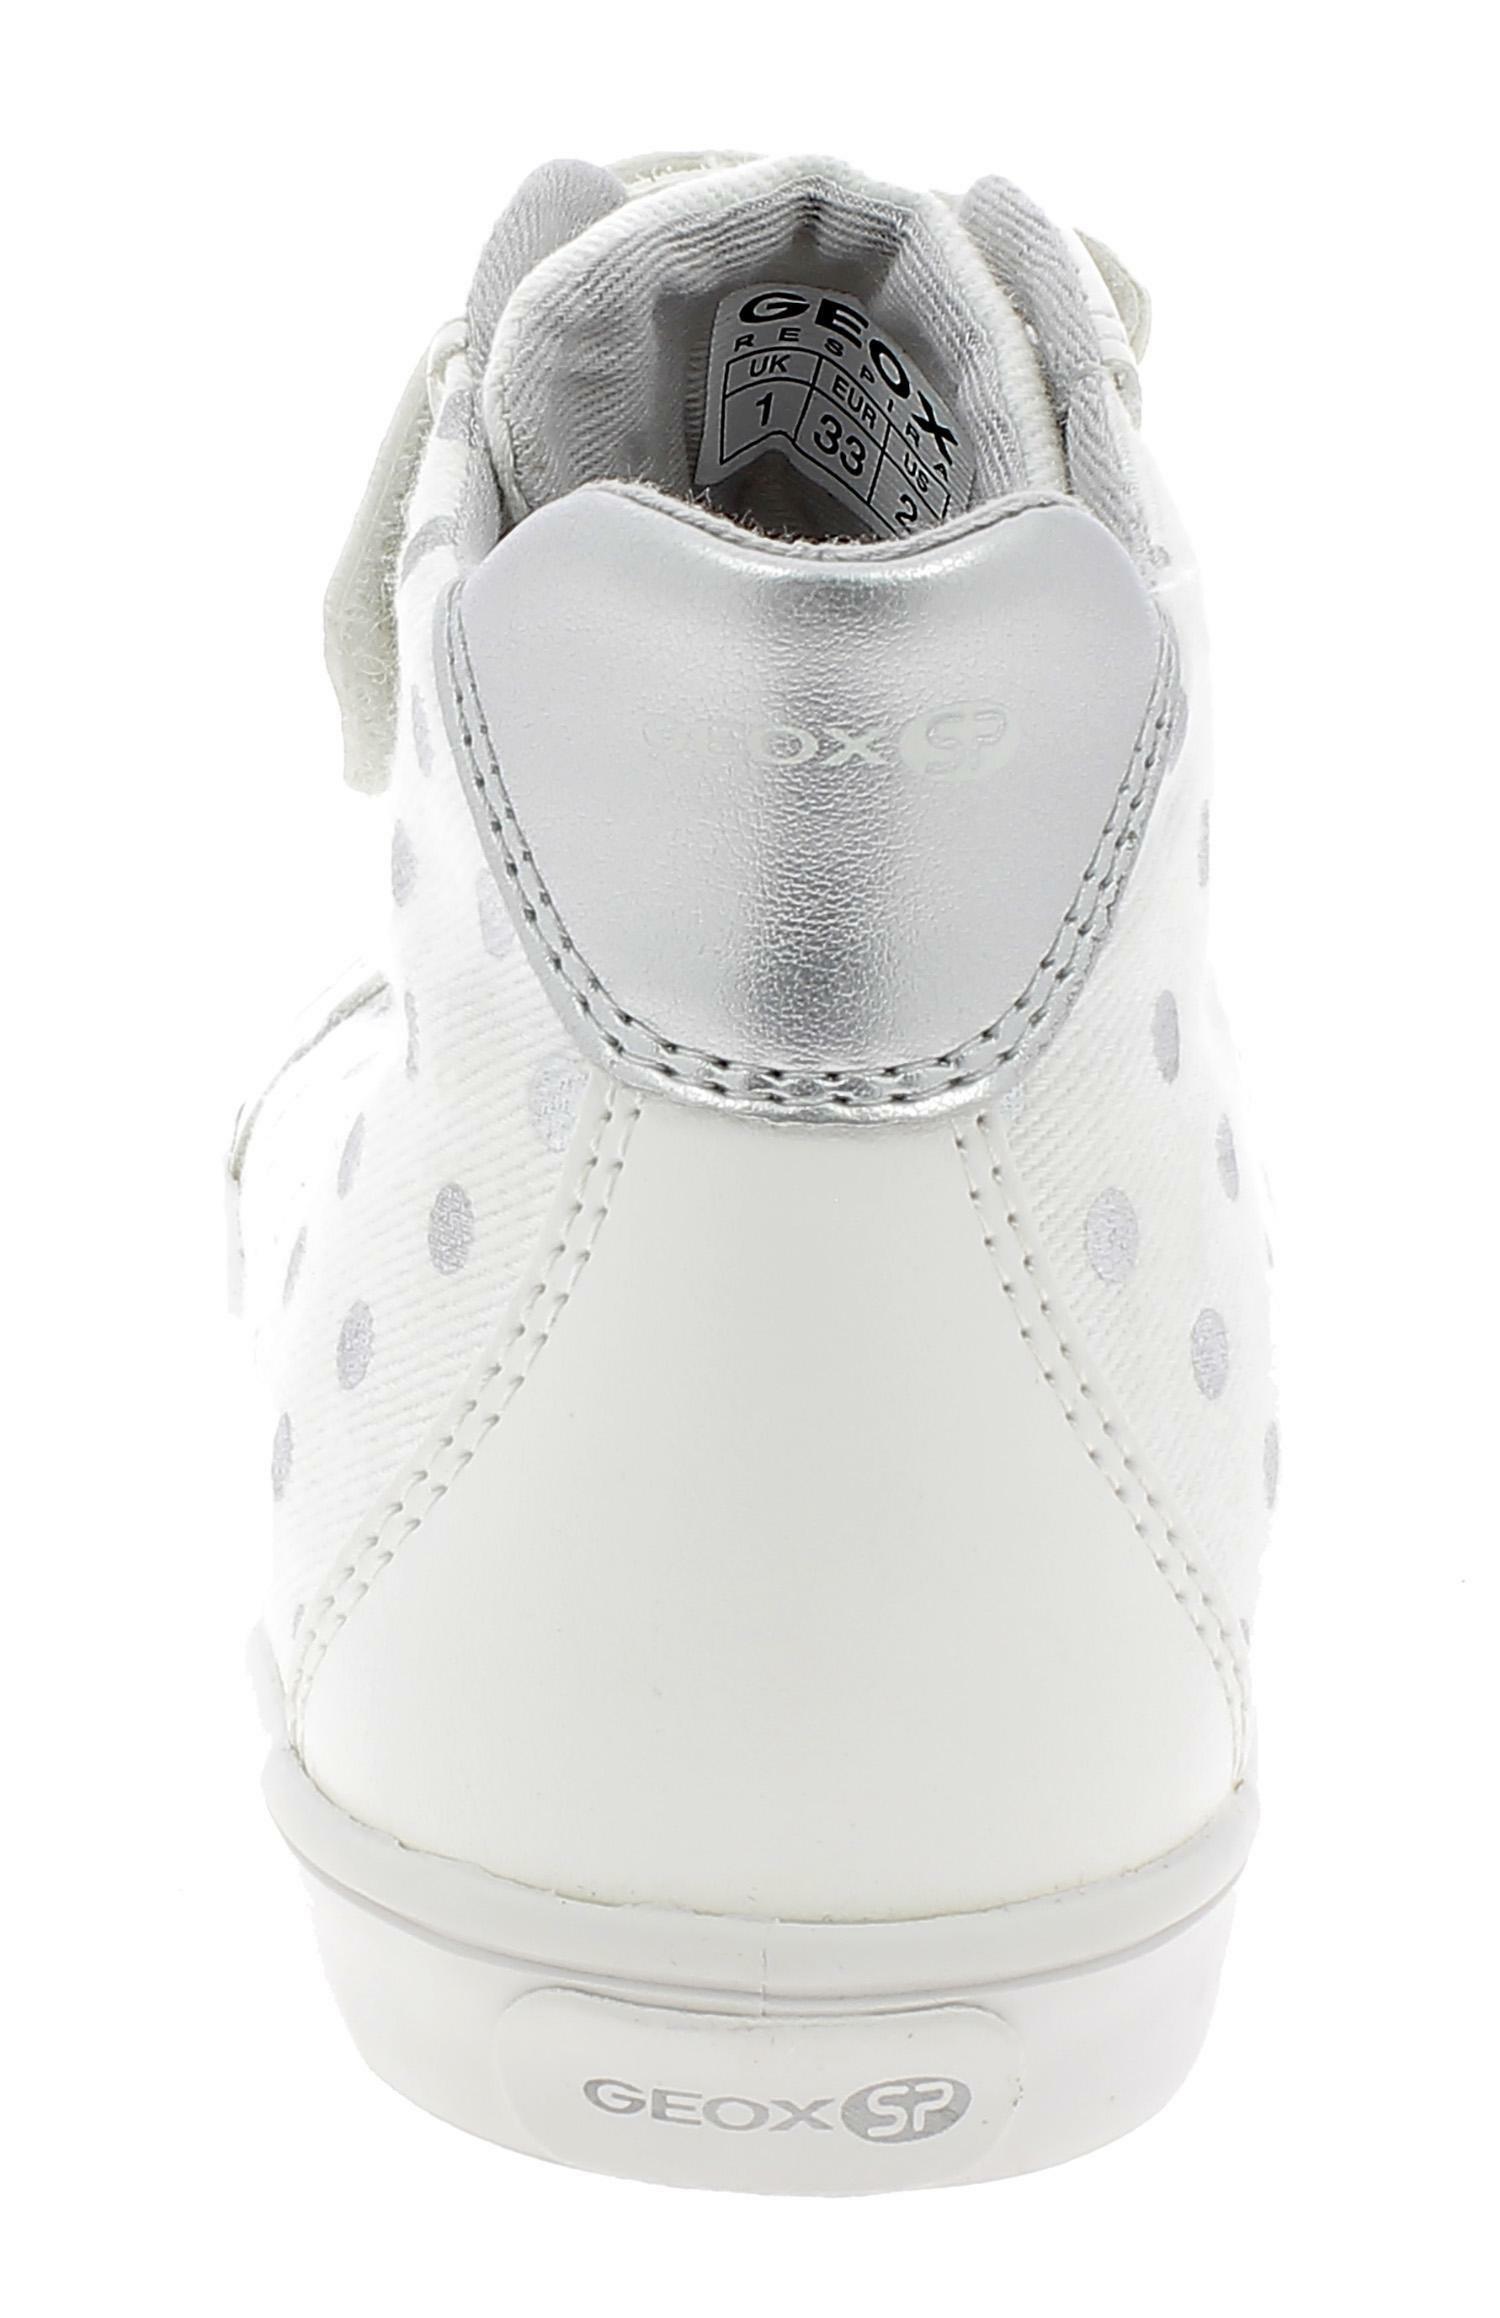 geox j gisli g scarpe bambina bianche j924nac0007